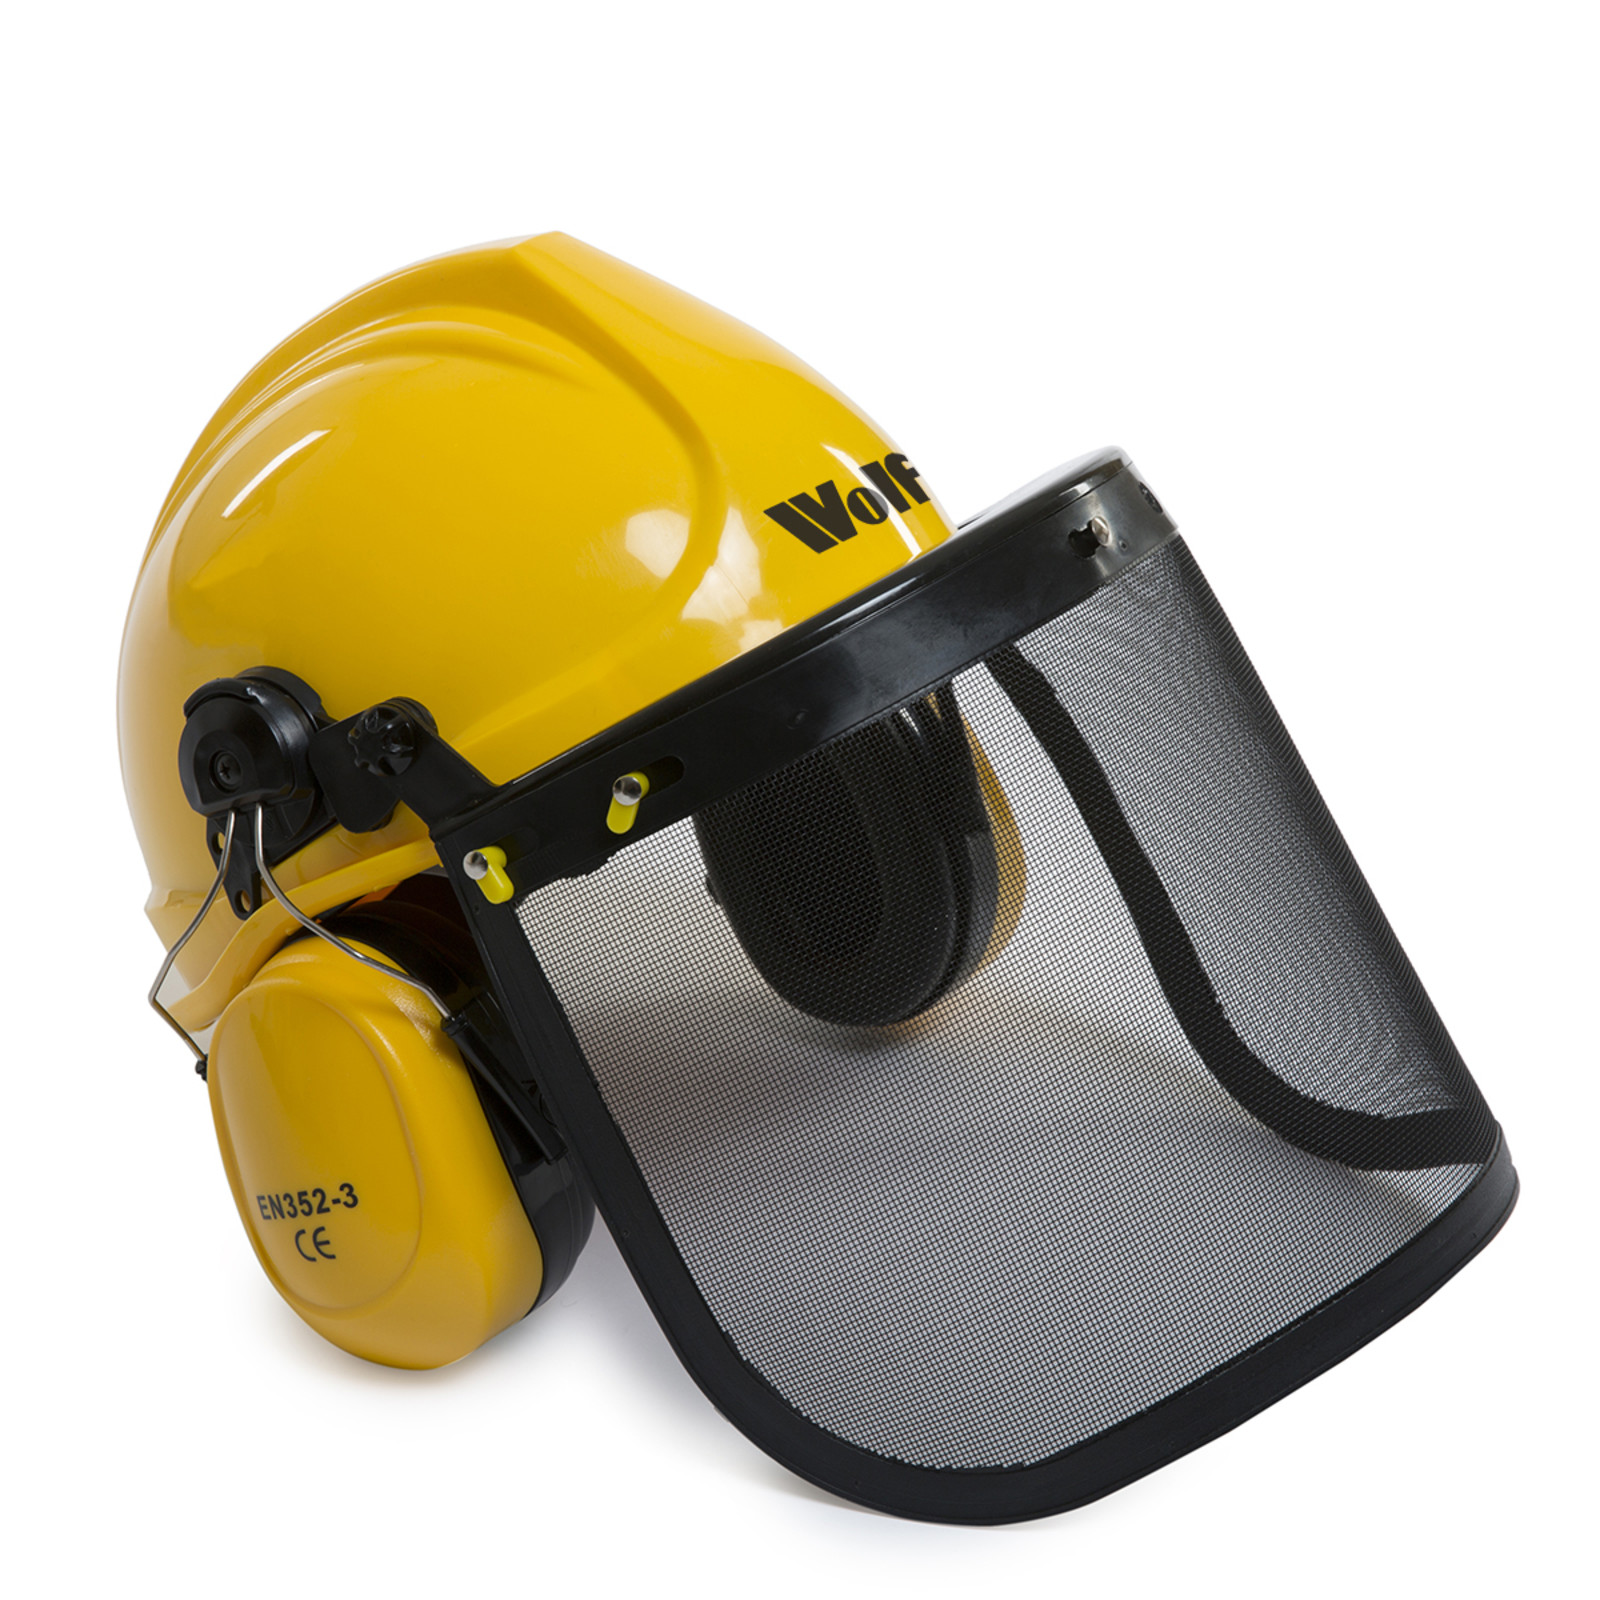 BMC 20'' Easy Start 55cc Chainsaw with 1 Ltr Chain Oil, 1 Ltr 2 Stroke Oil,  Bag & Safety Helmet